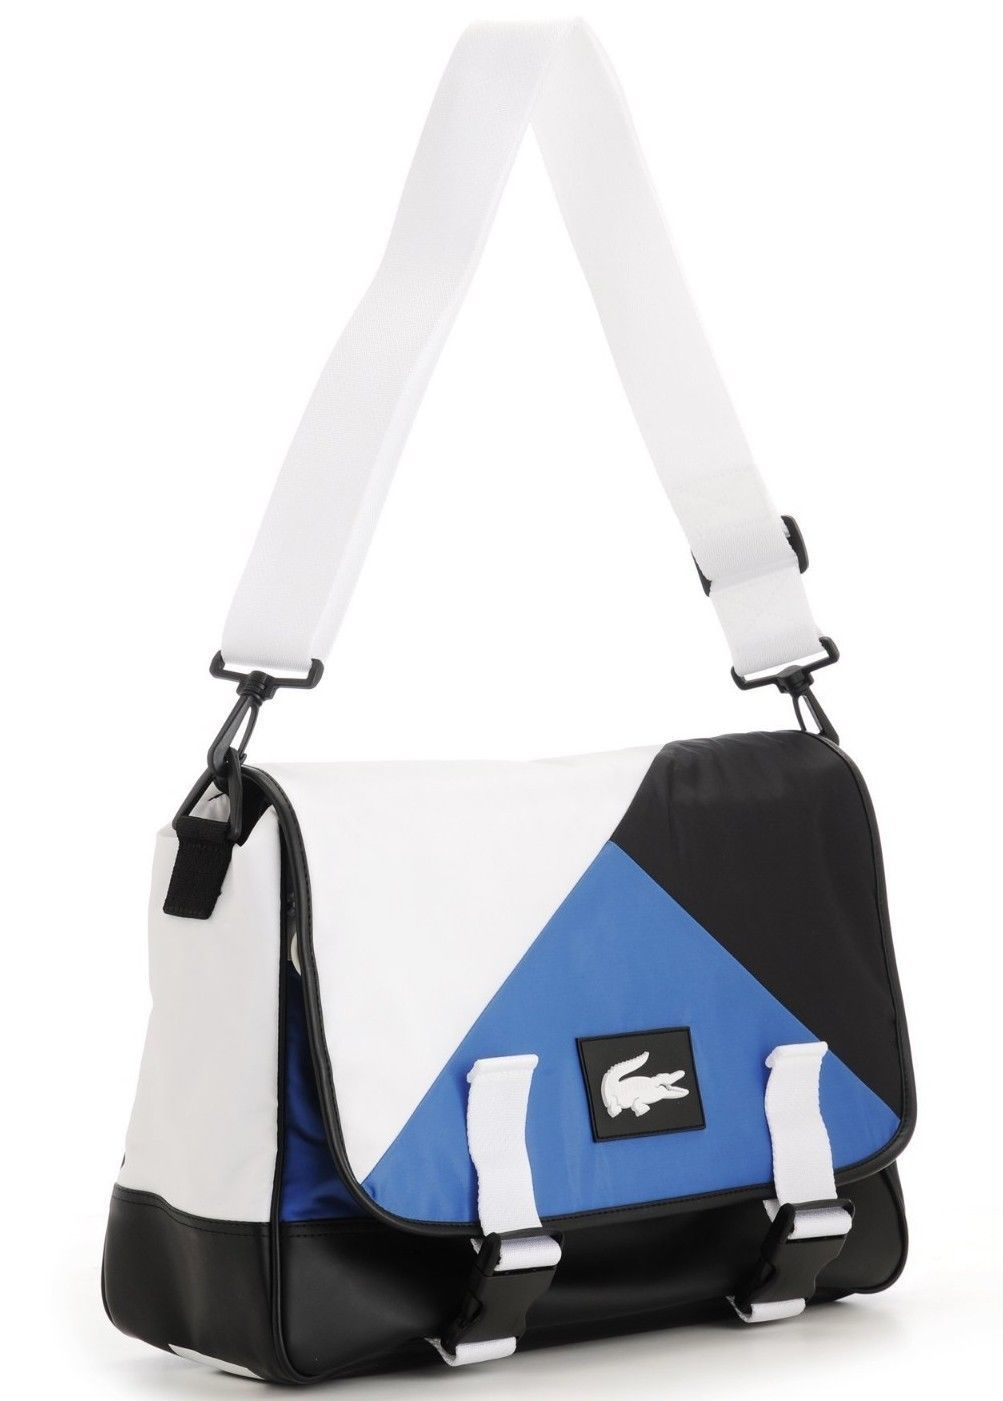 fdcdacb986 Lacoste Gym Bag White